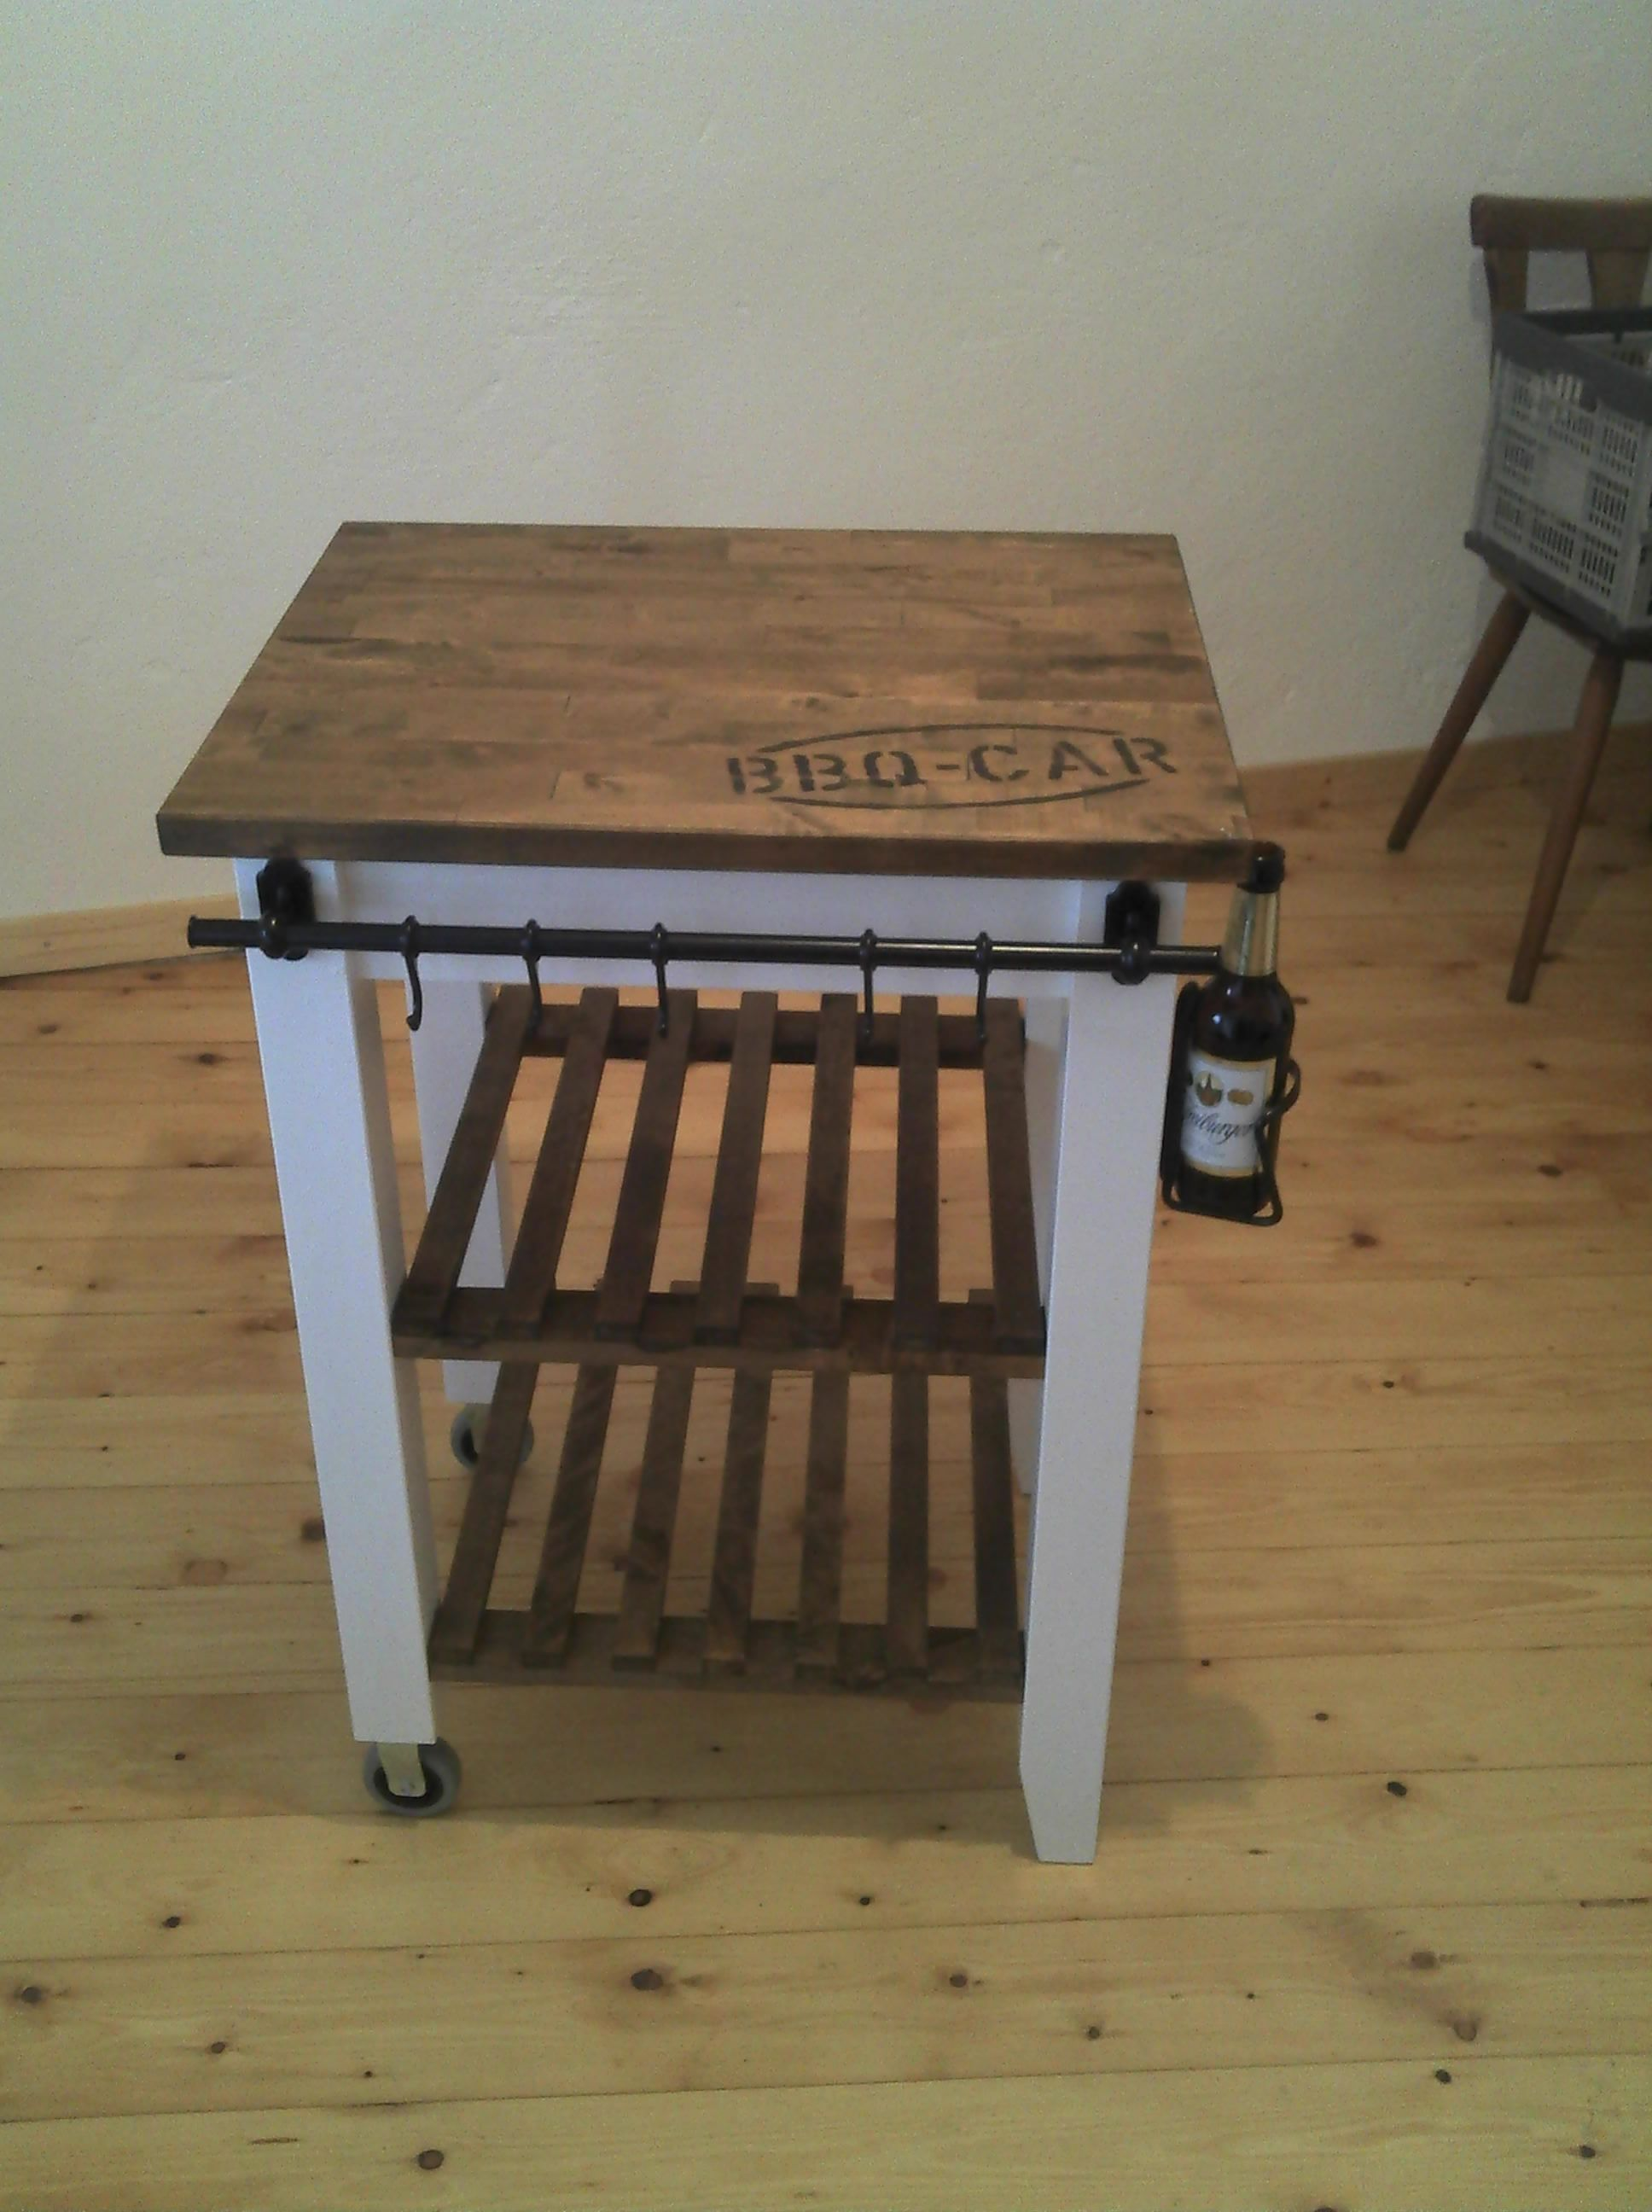 Grillwagen Oder Bbq Car Bauanleitung Zum Selber Bauen Ikea Kuchenideen Grill Beistelltisch Grilltisch